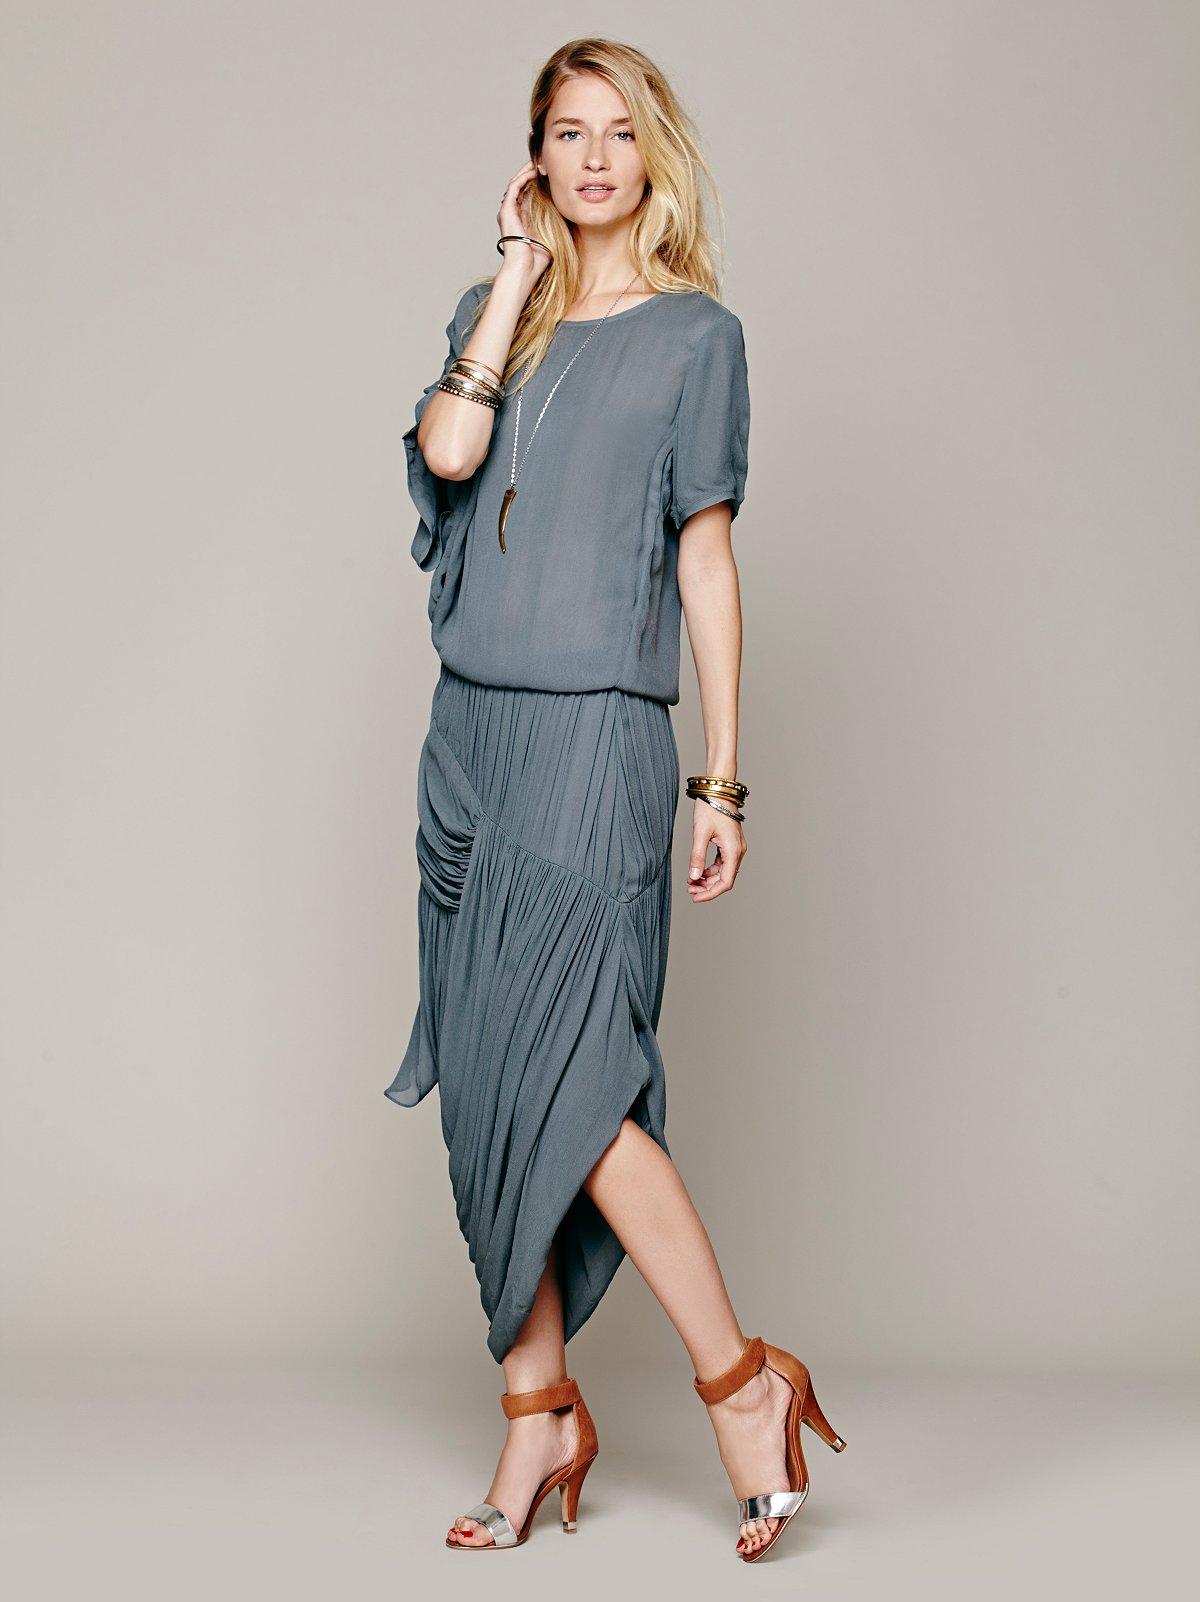 Syble Dress